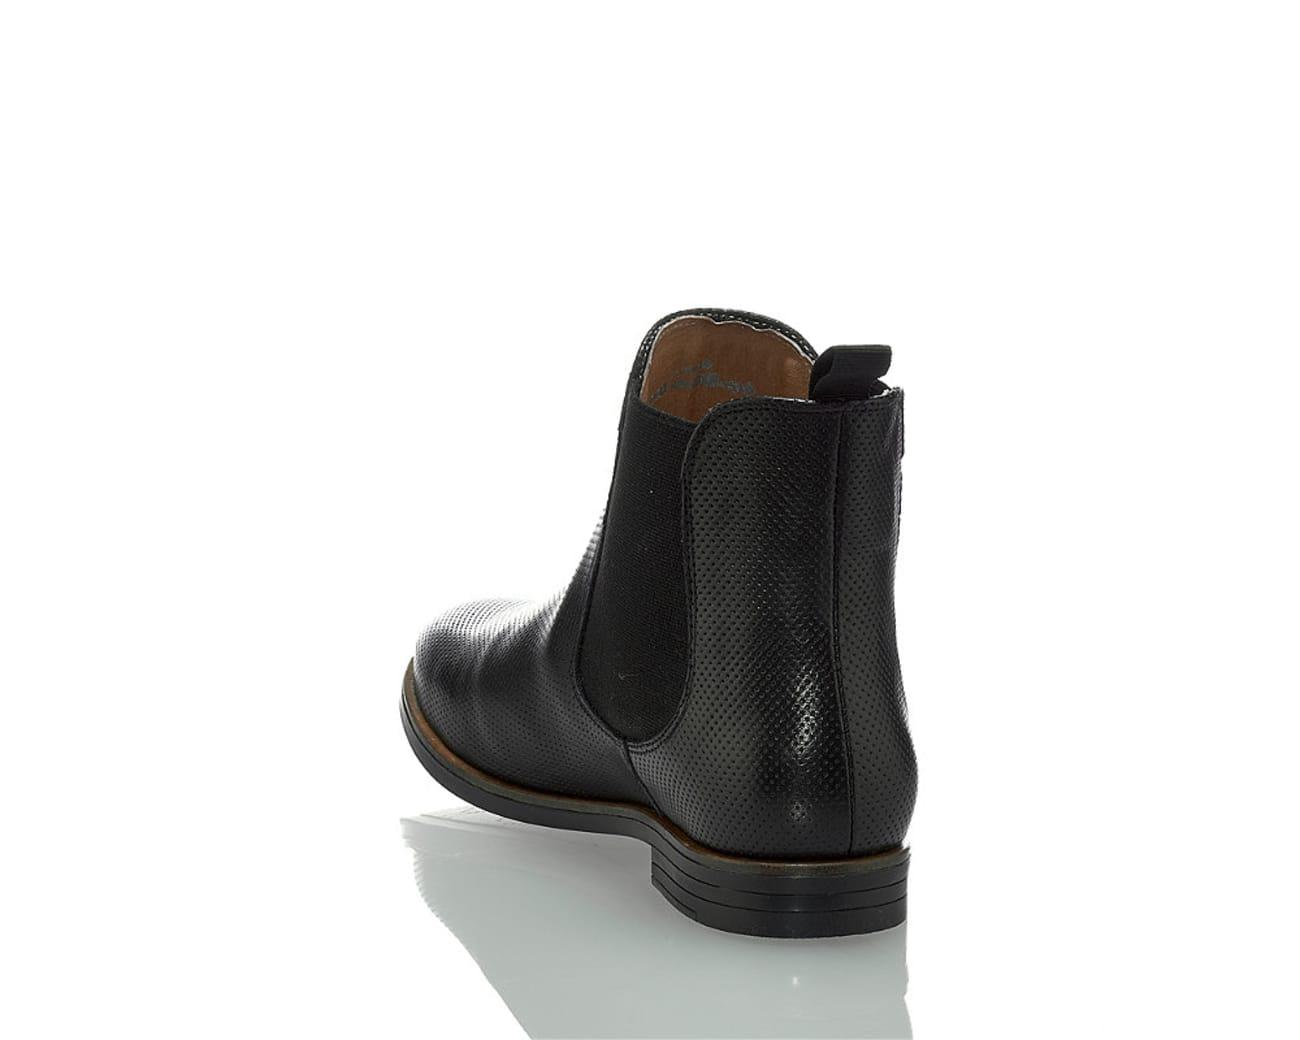 ad22eff84ab844 Varese Eva Damen Chelsea Boot Grau